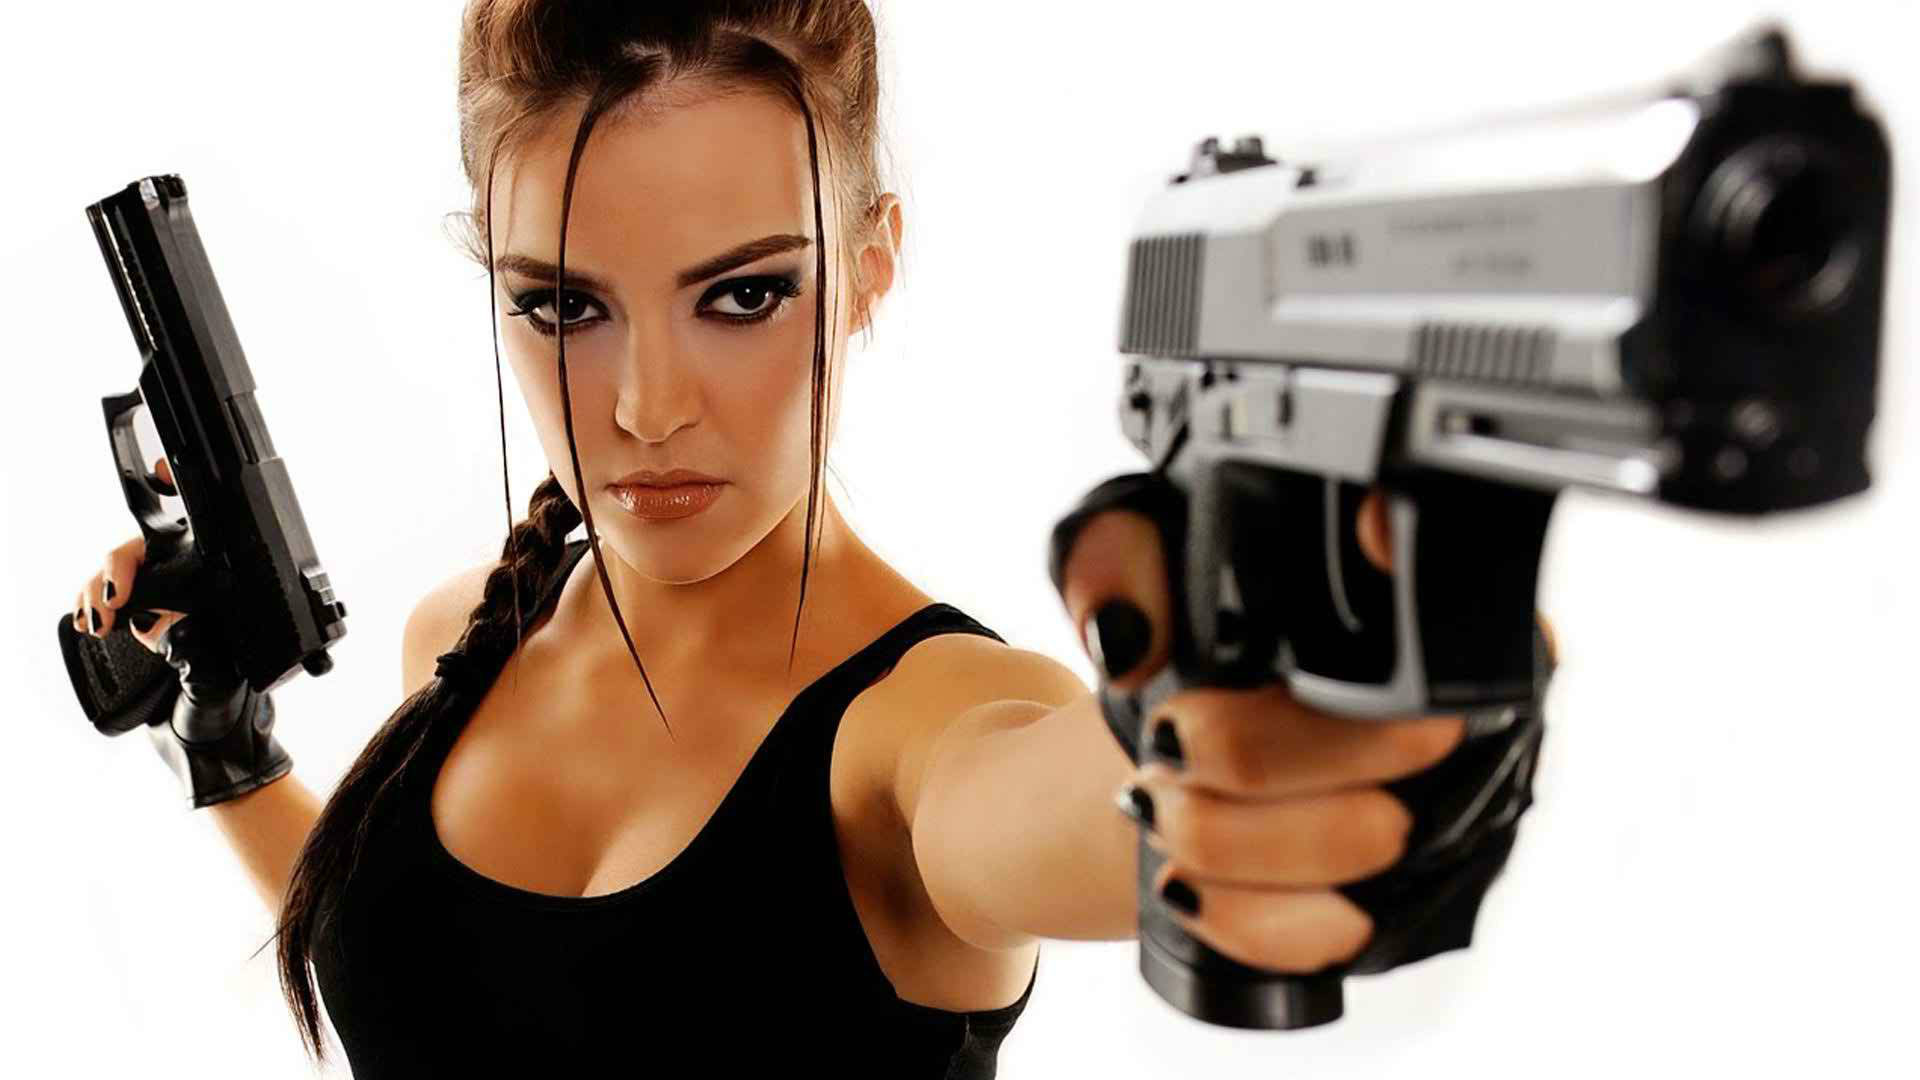 Guns Wallpaper Beautiful Girl with Guns